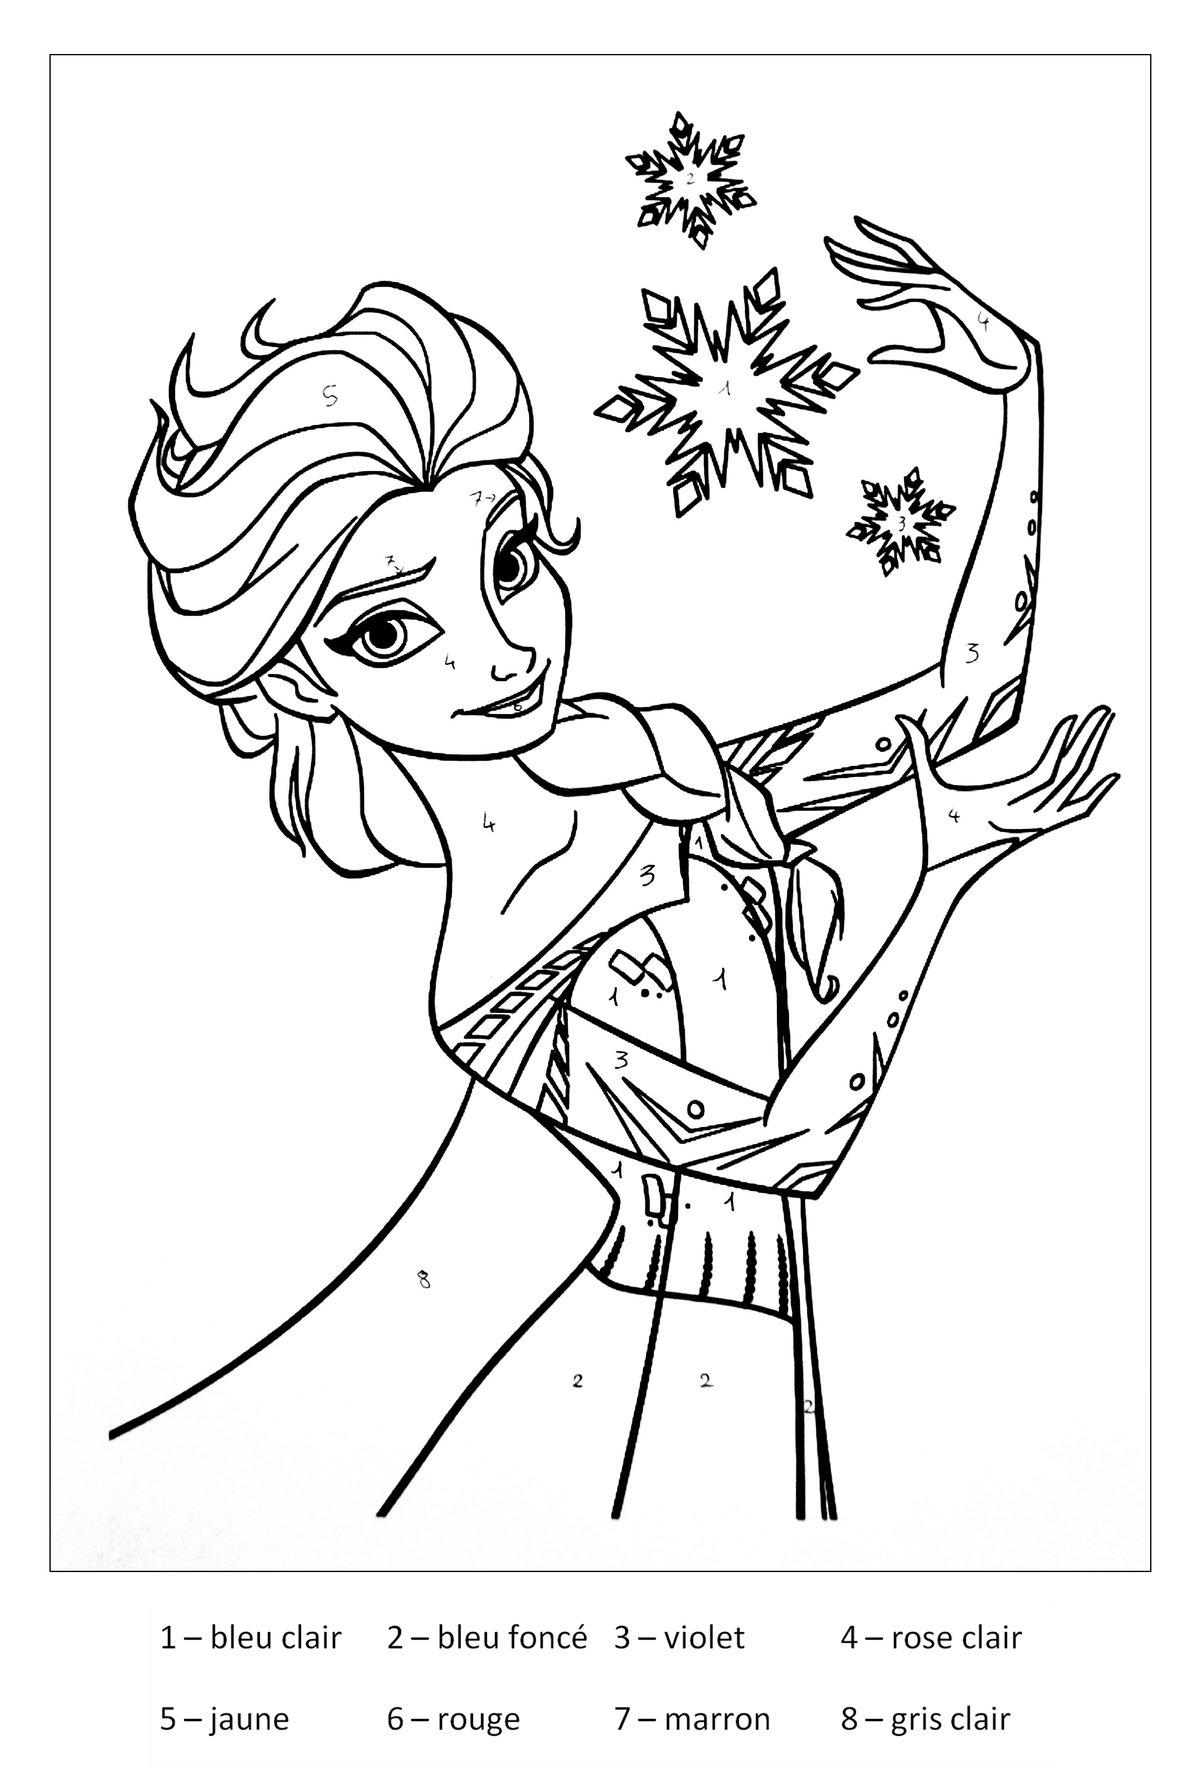 Gambar Mewarnai Princess Elsa Gambar Aneh Unik Lucu Card From